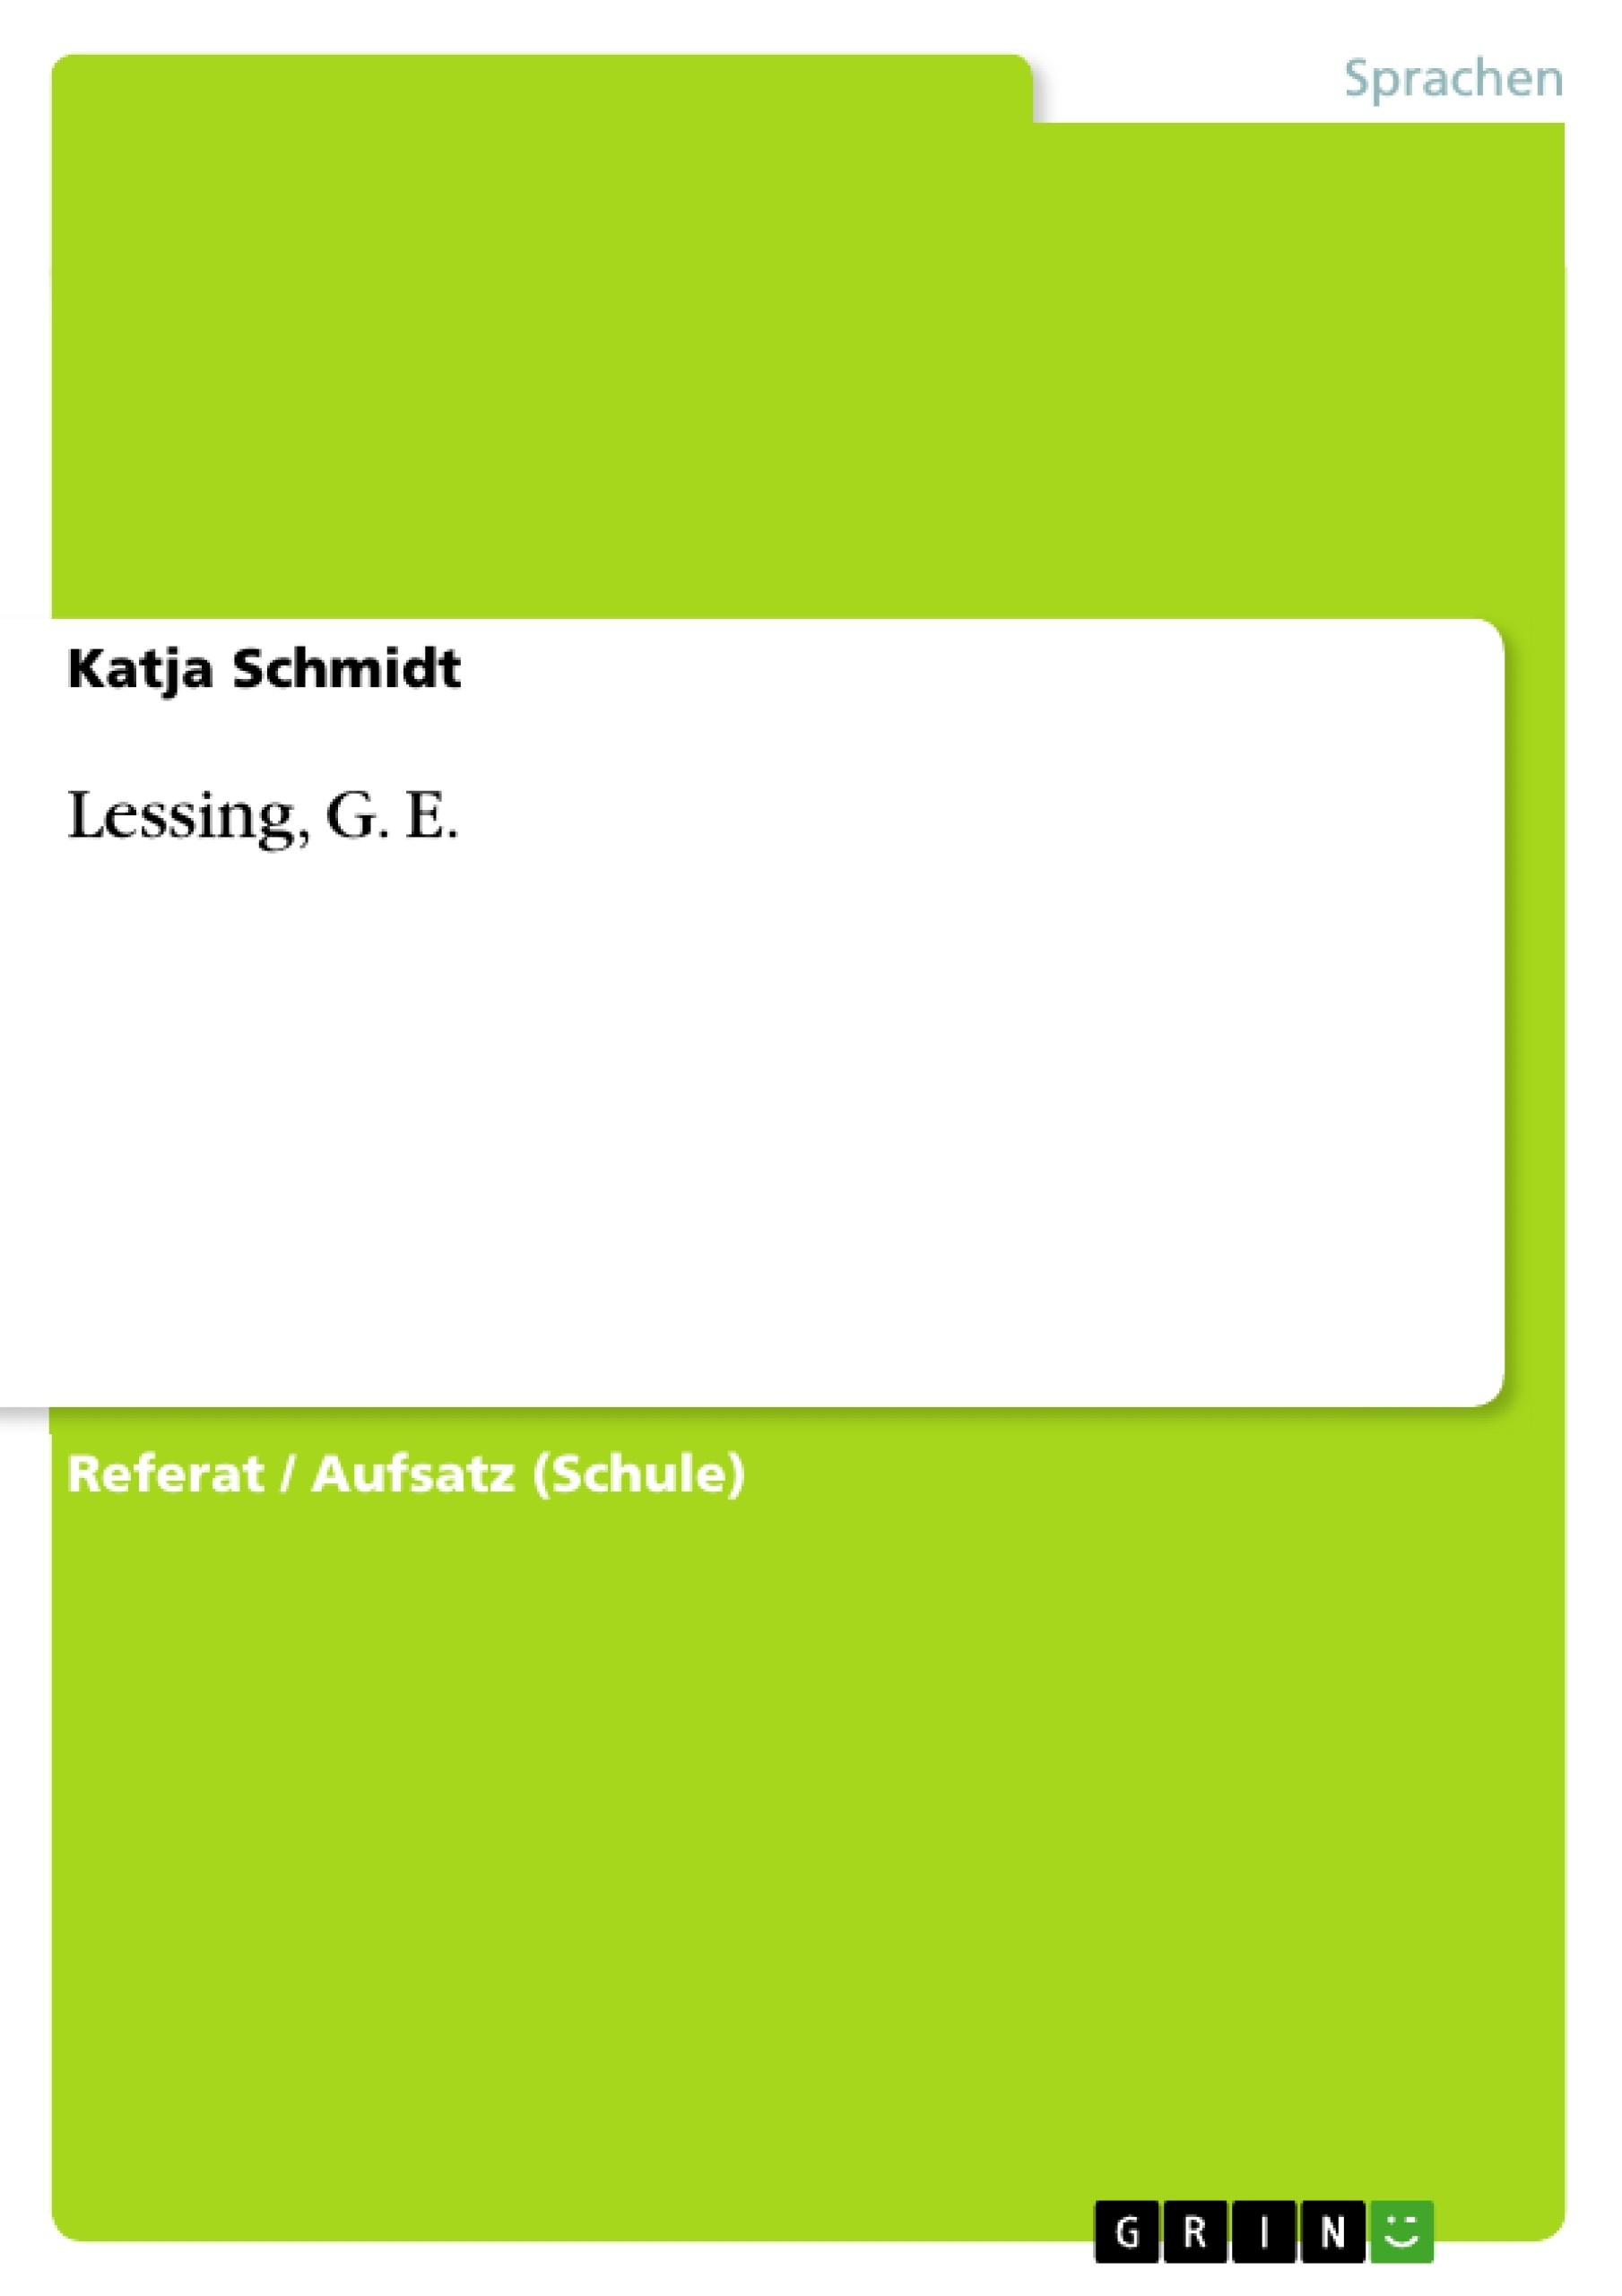 Titel: Lessing, G. E.